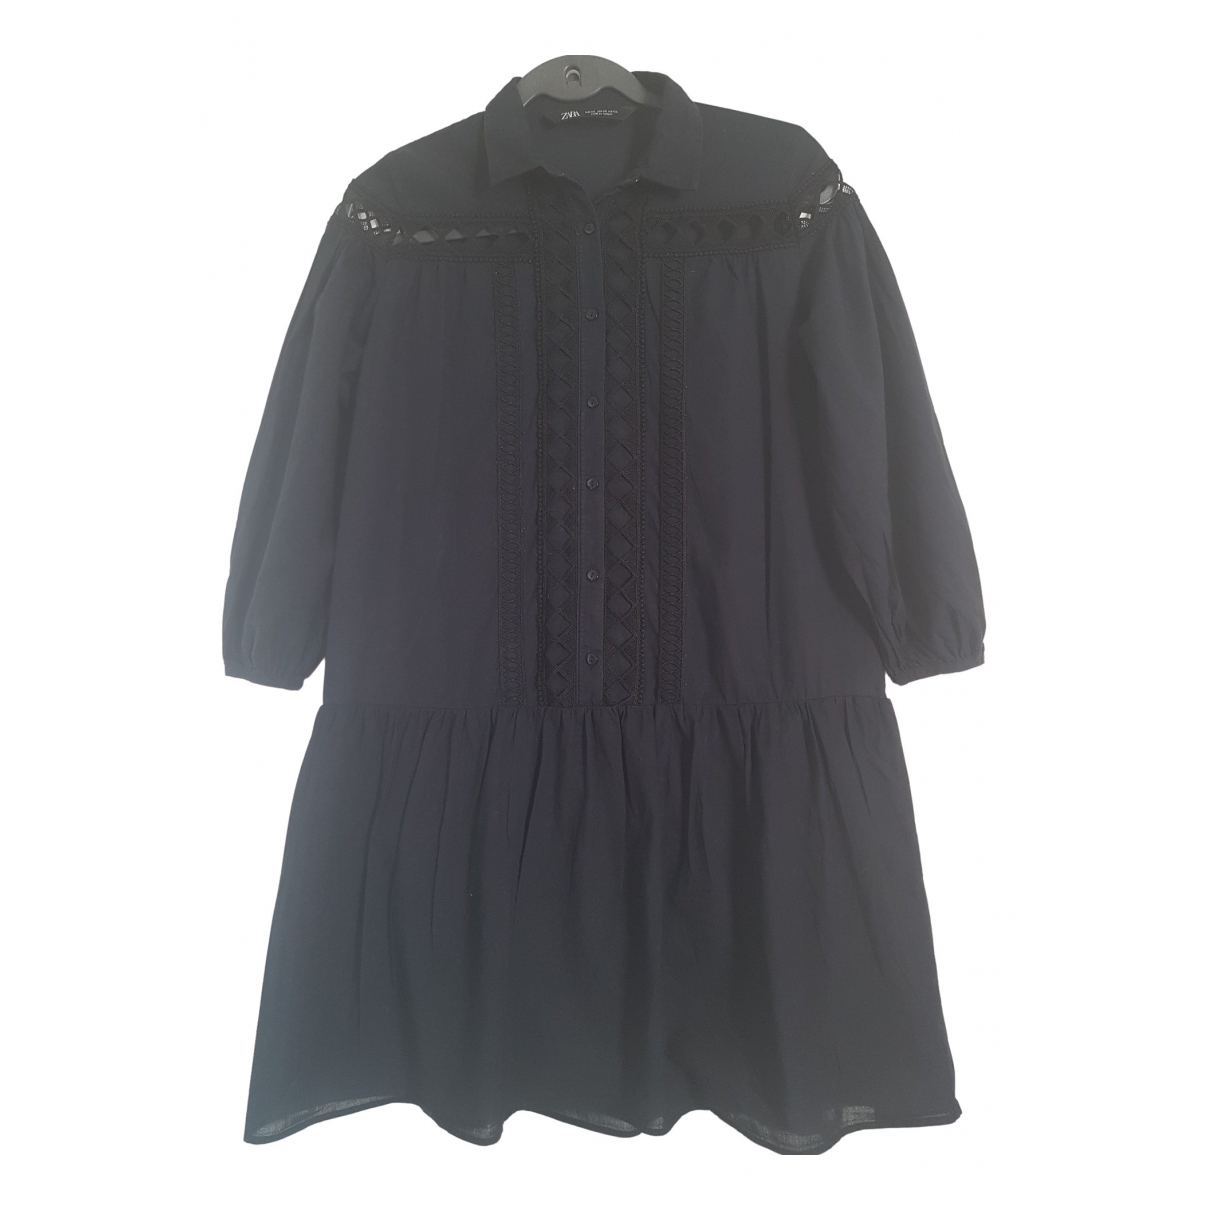 Zara \N Black Cotton dress for Women XS International